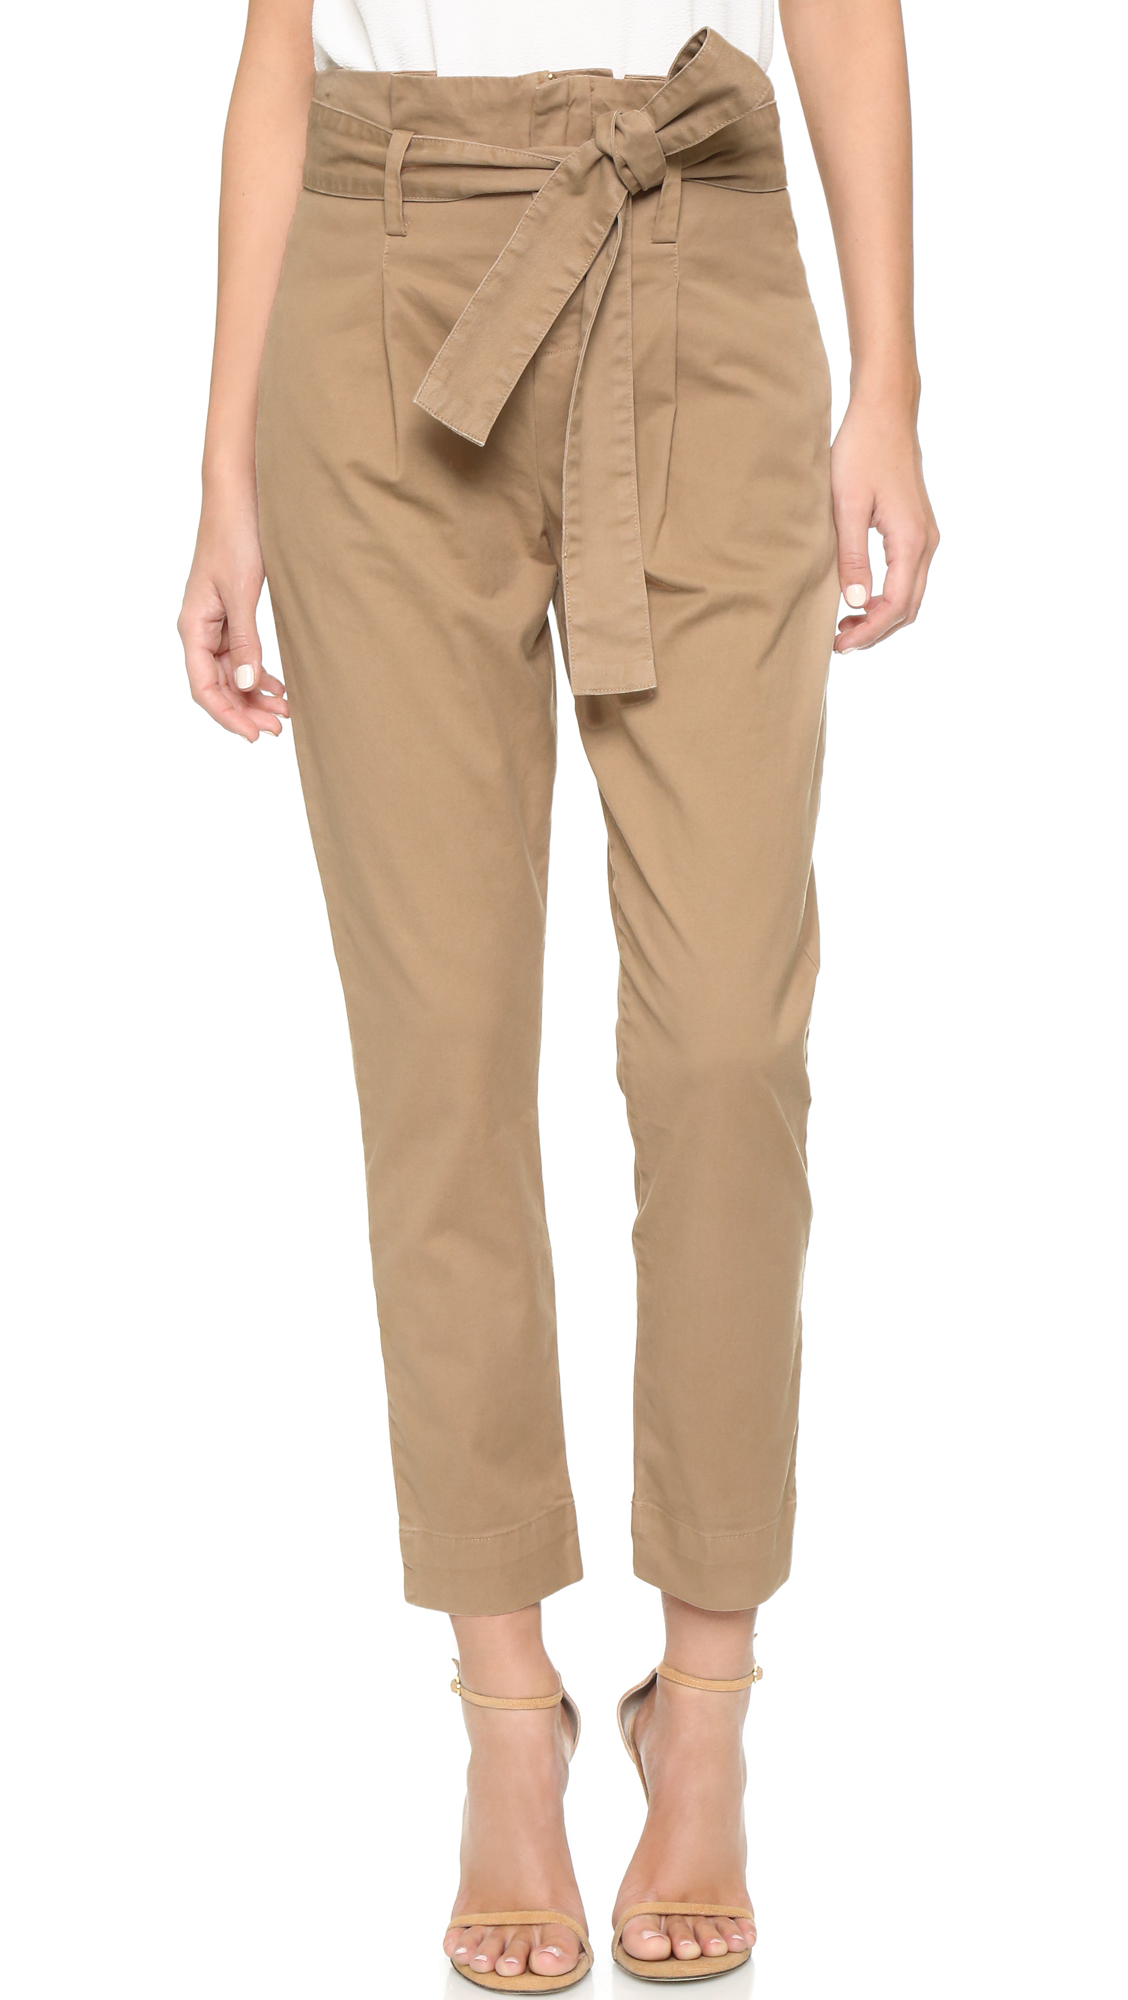 Paper bag trousers - Paper Bag Trousers 16